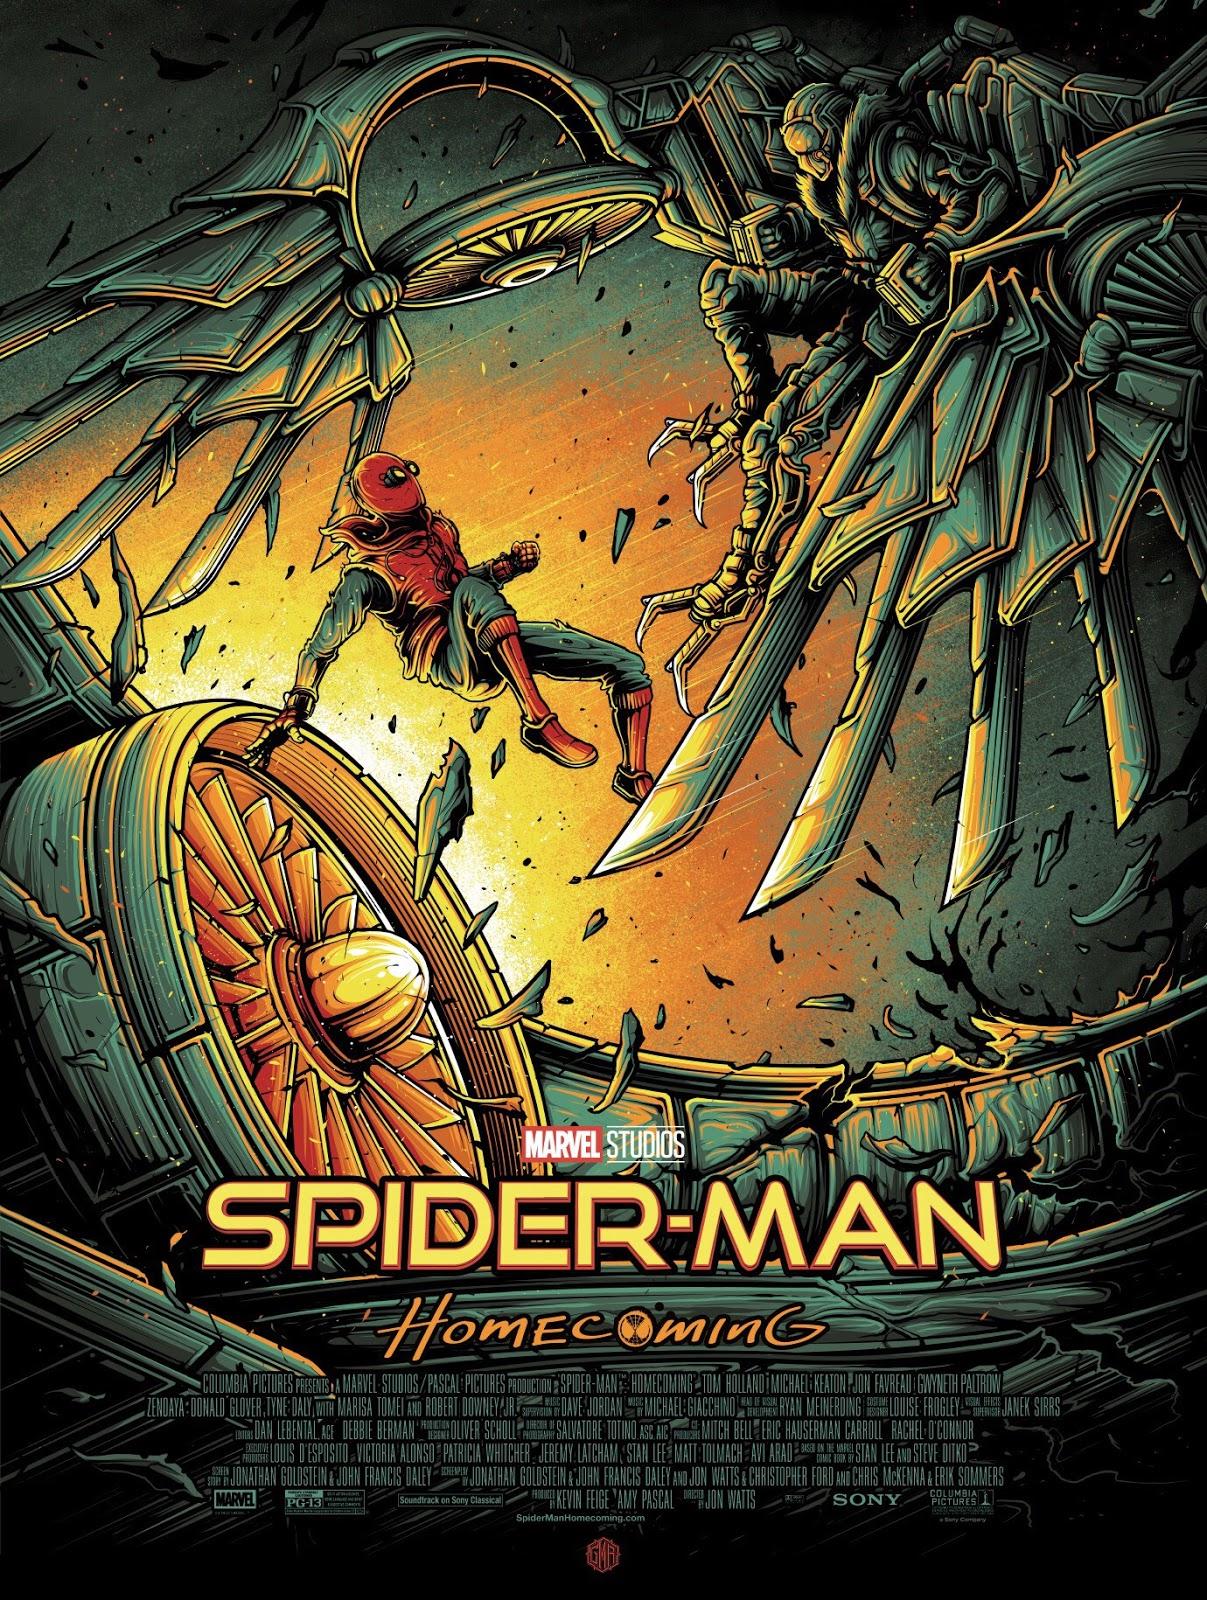 Inside The Rock Poster Frame Blog Dan Mumford Spider Man